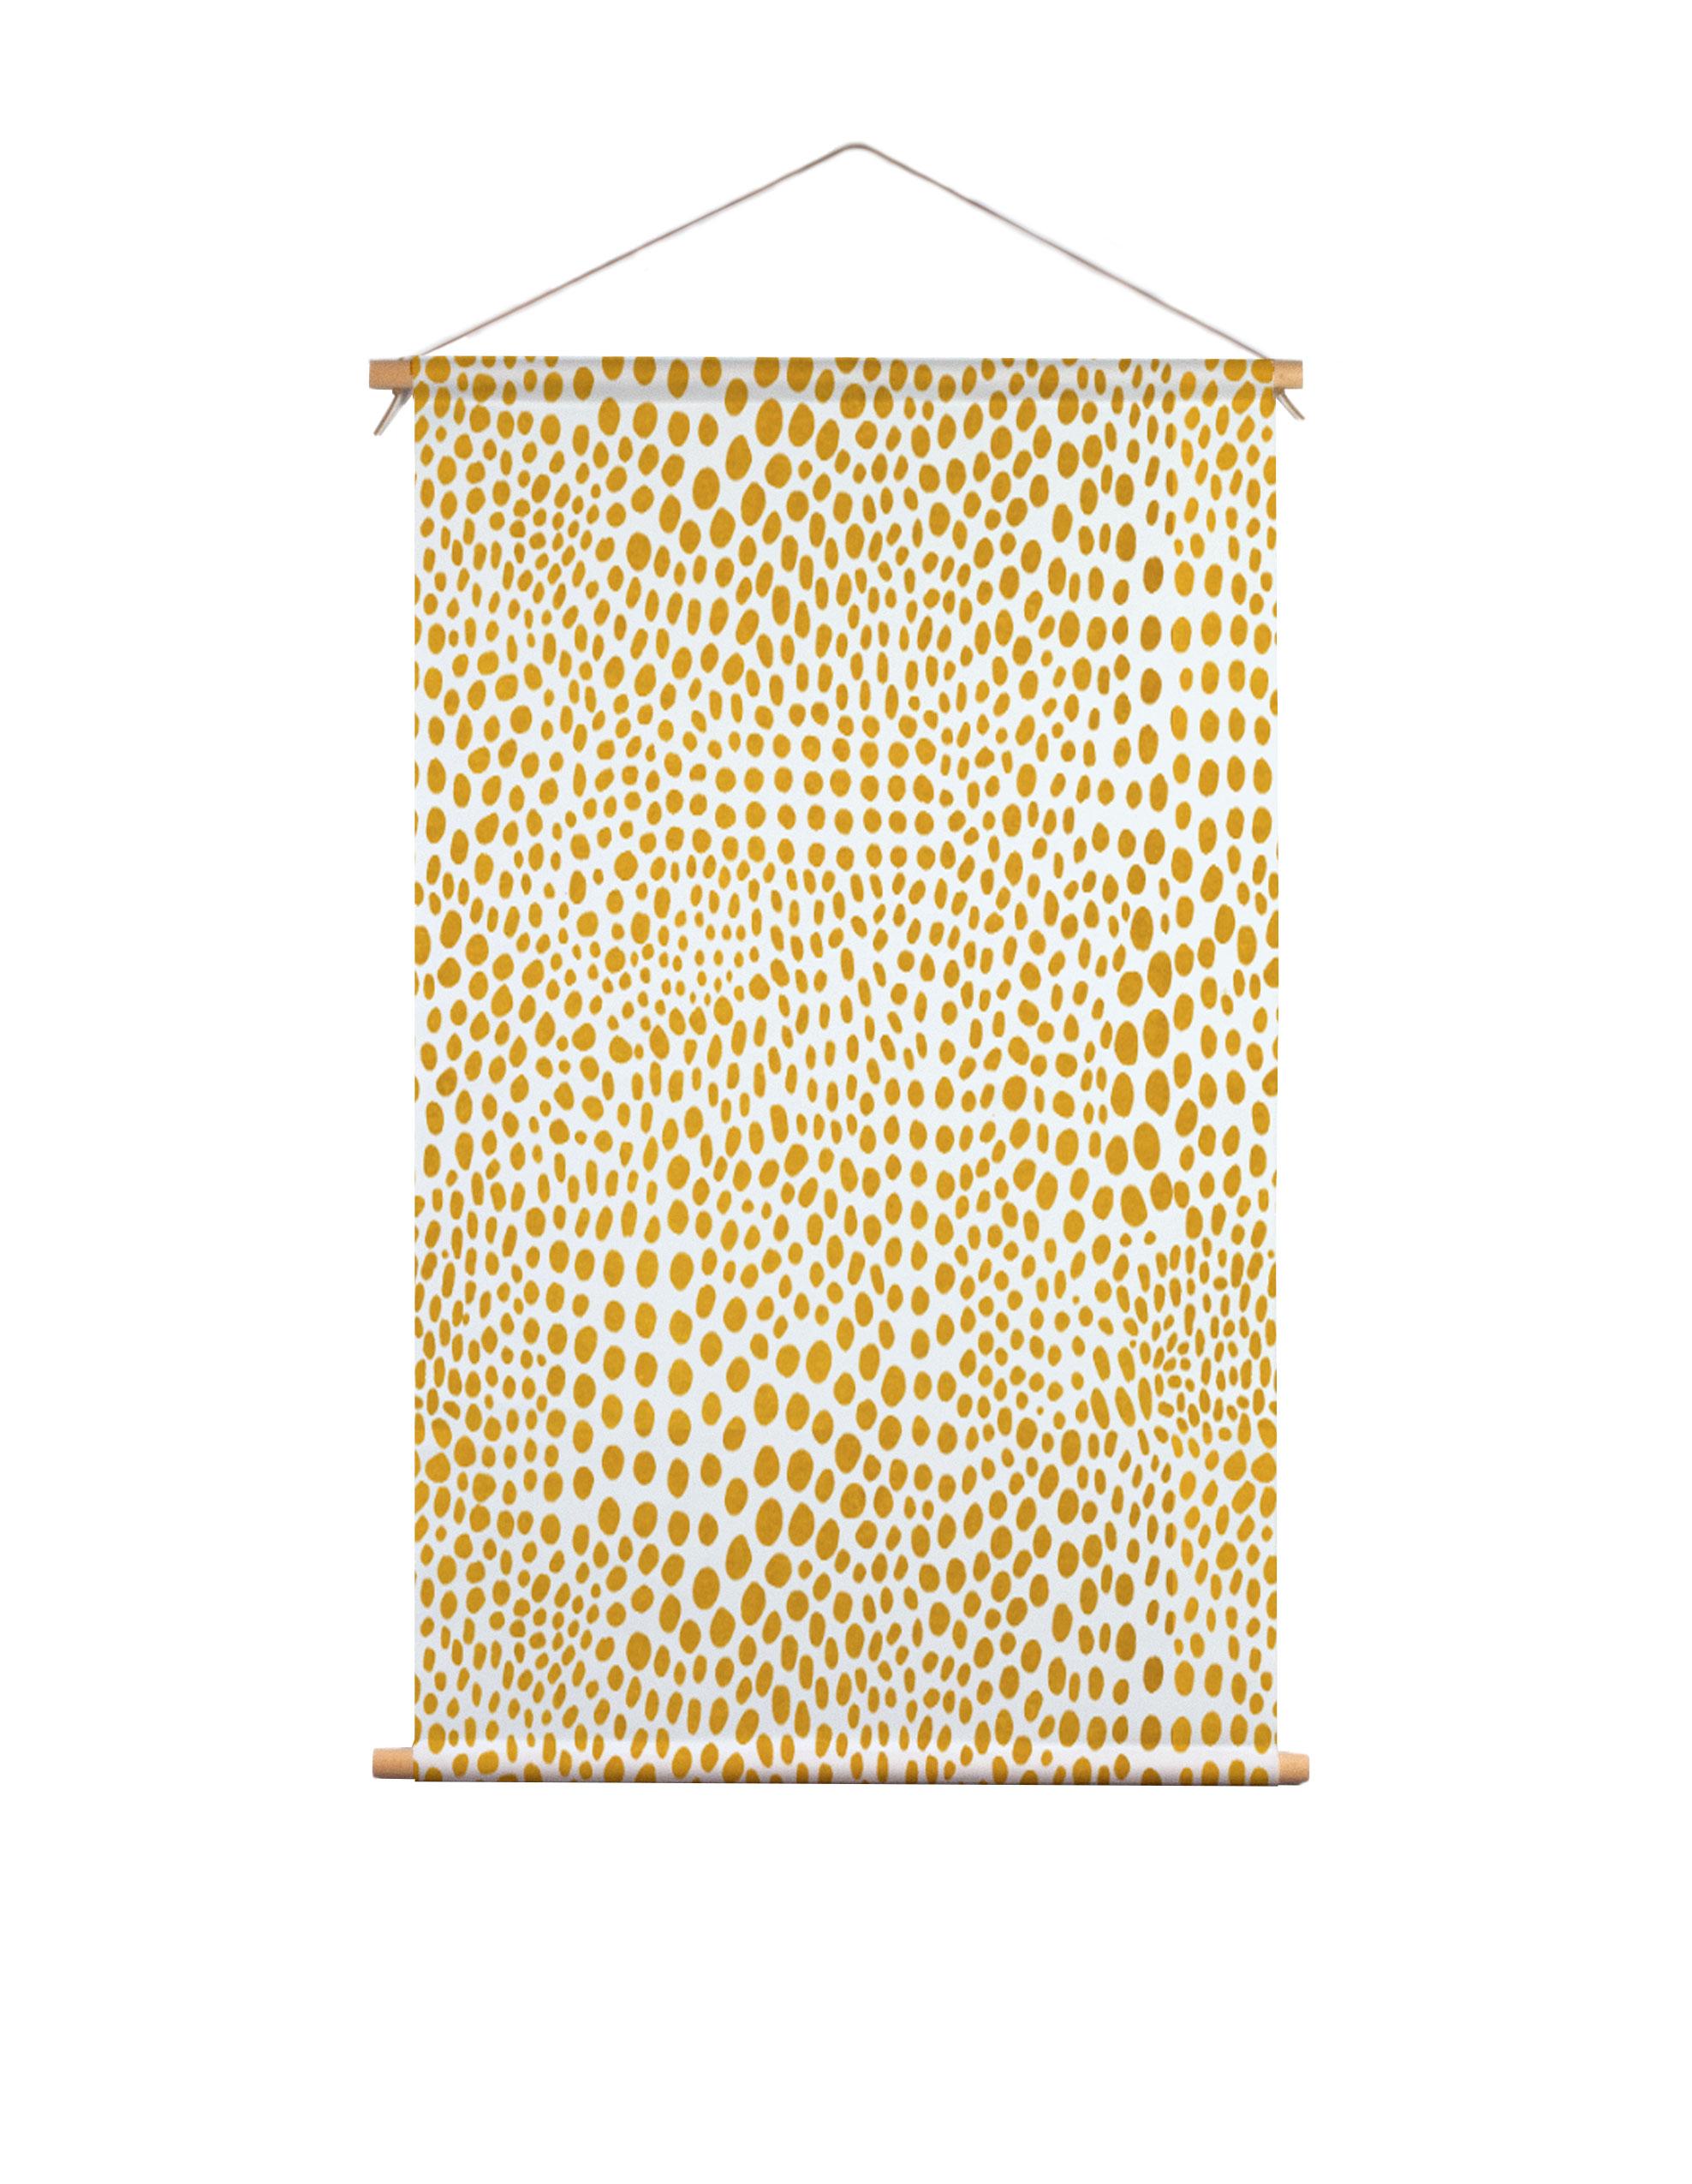 Textielposter-stippen-Dorrith-Rem